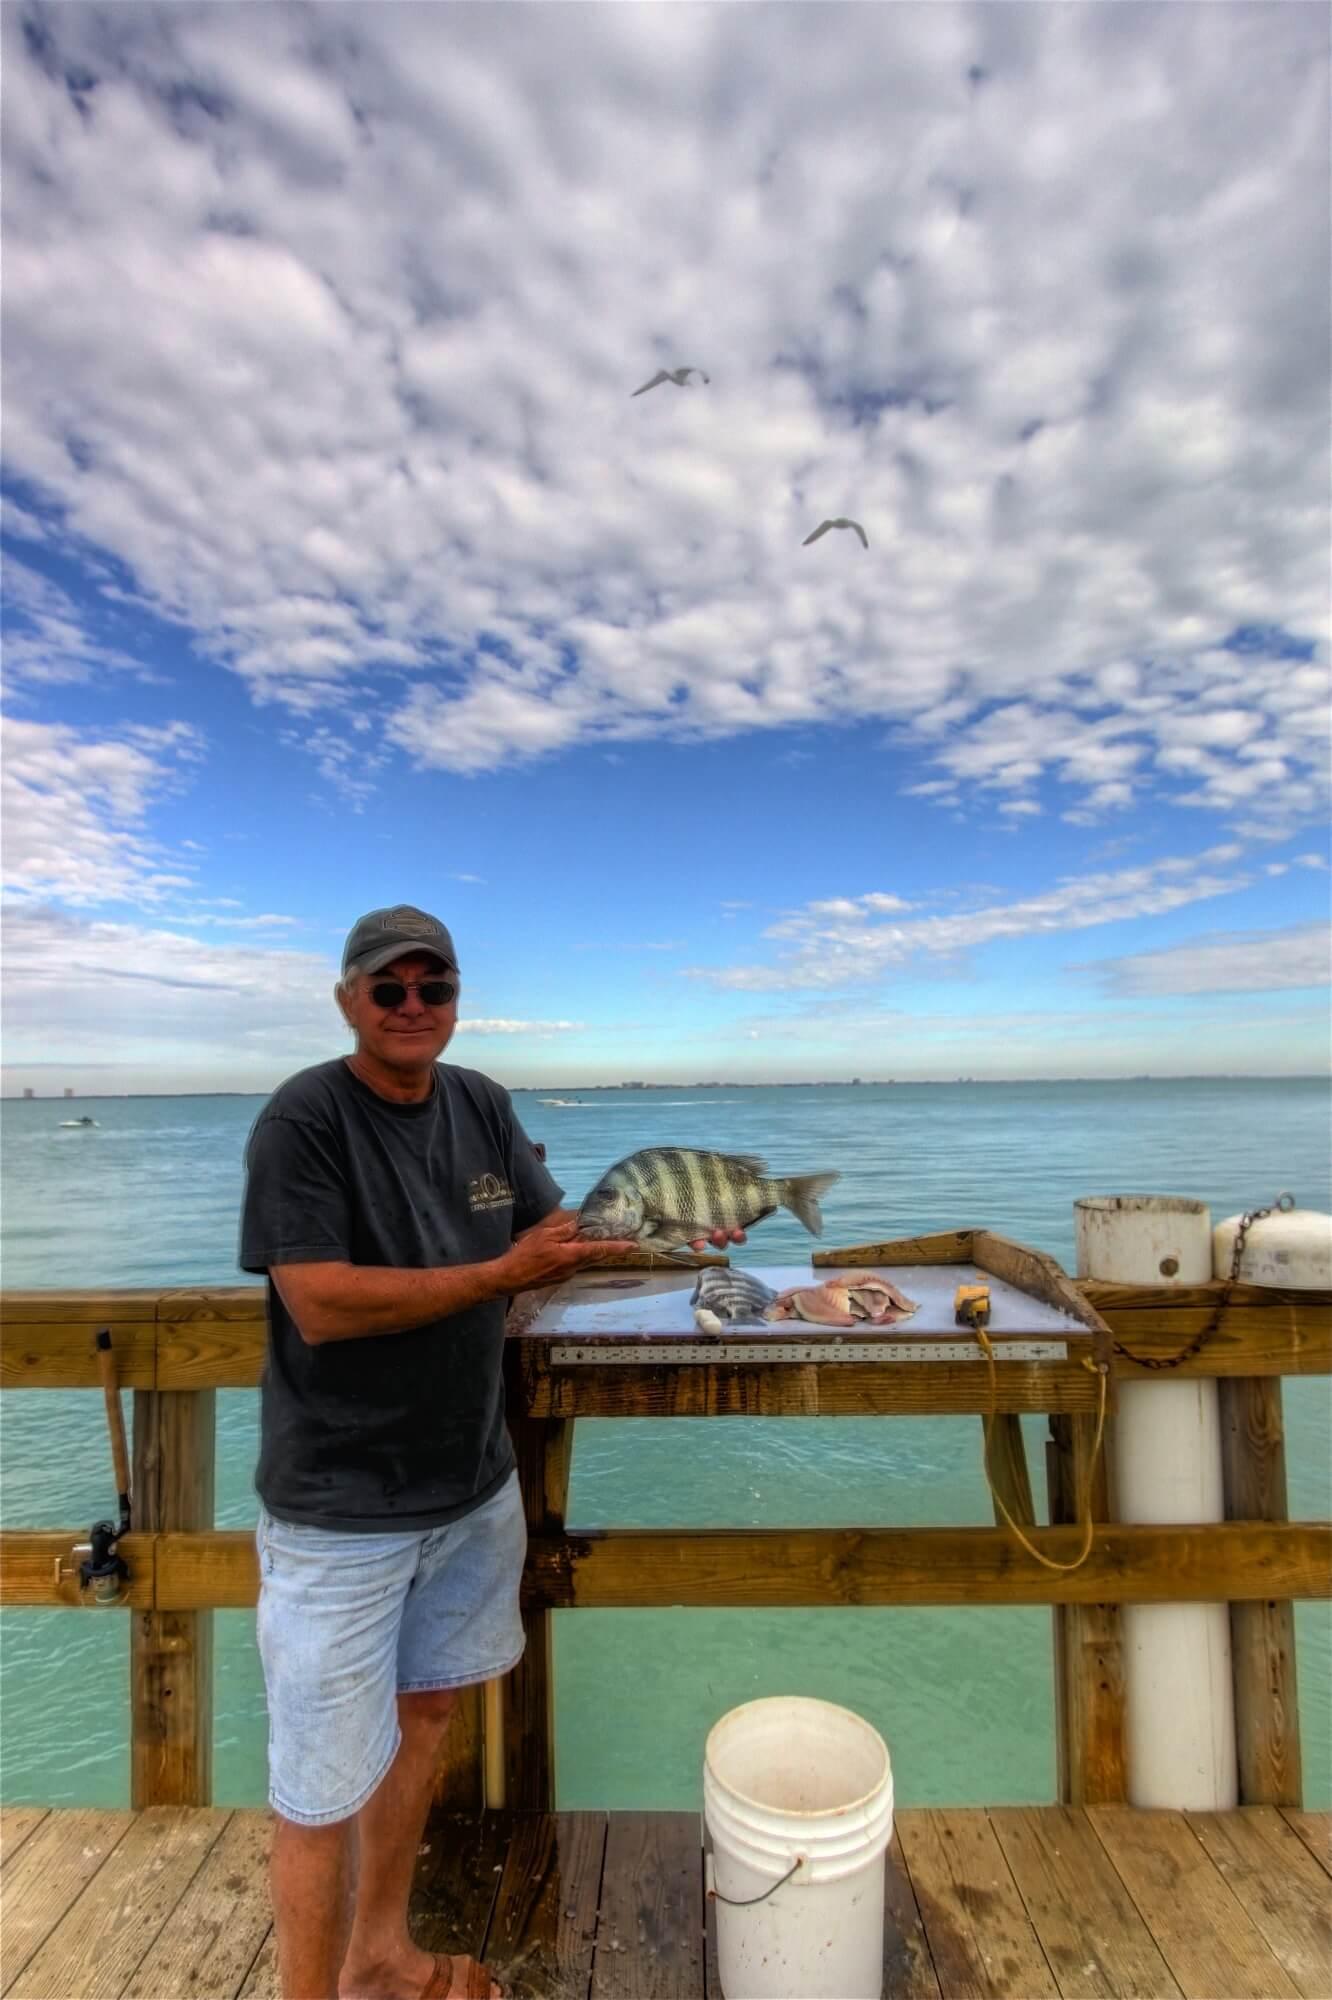 MustDo.com | Fisherman shows off his catch Sanibel Fishing Pier Sanibel Island, Florida